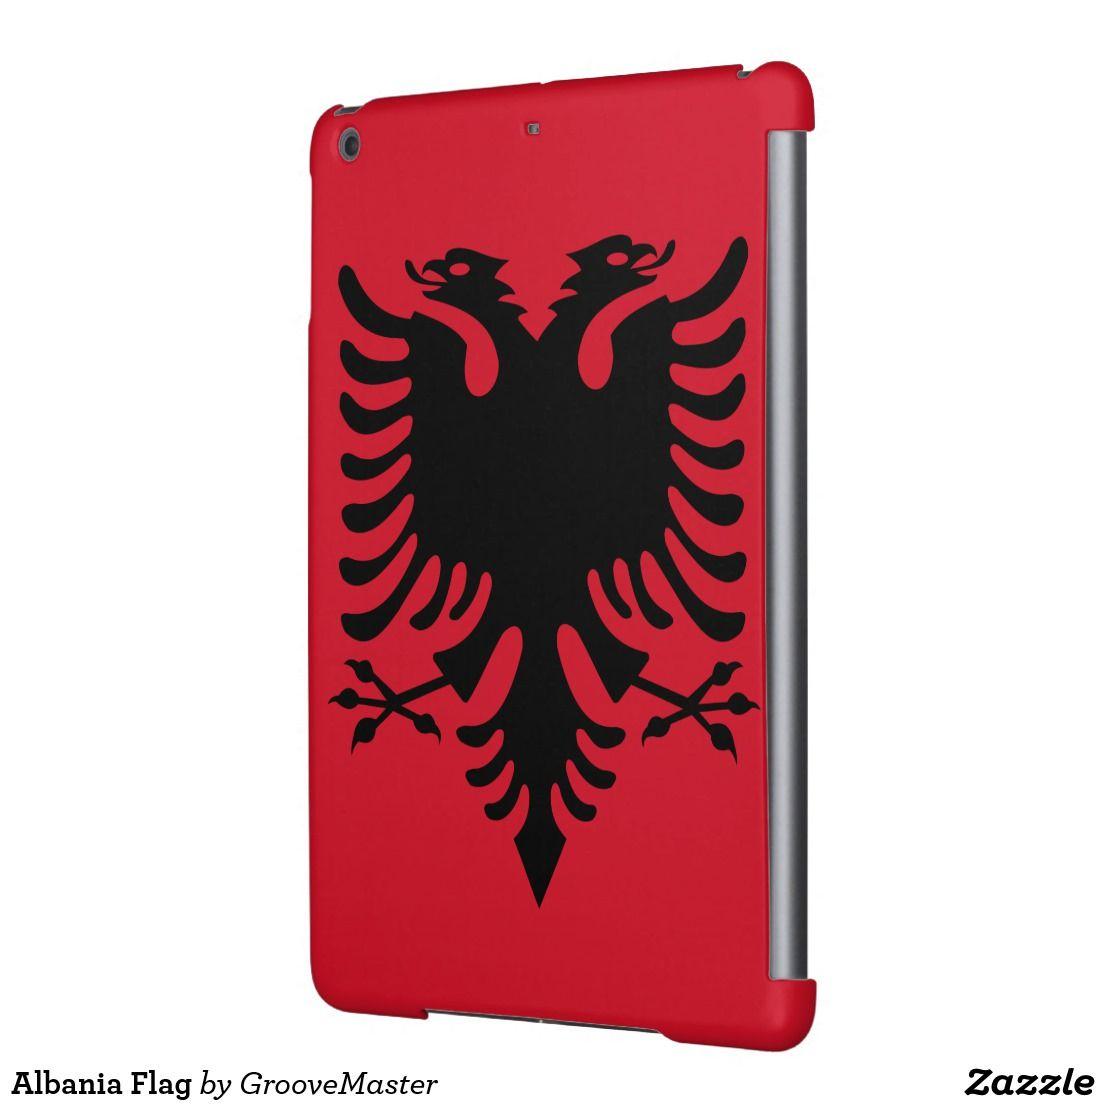 Albania Flag iPad Air Case | Albania, Ipad air case and Ipad air